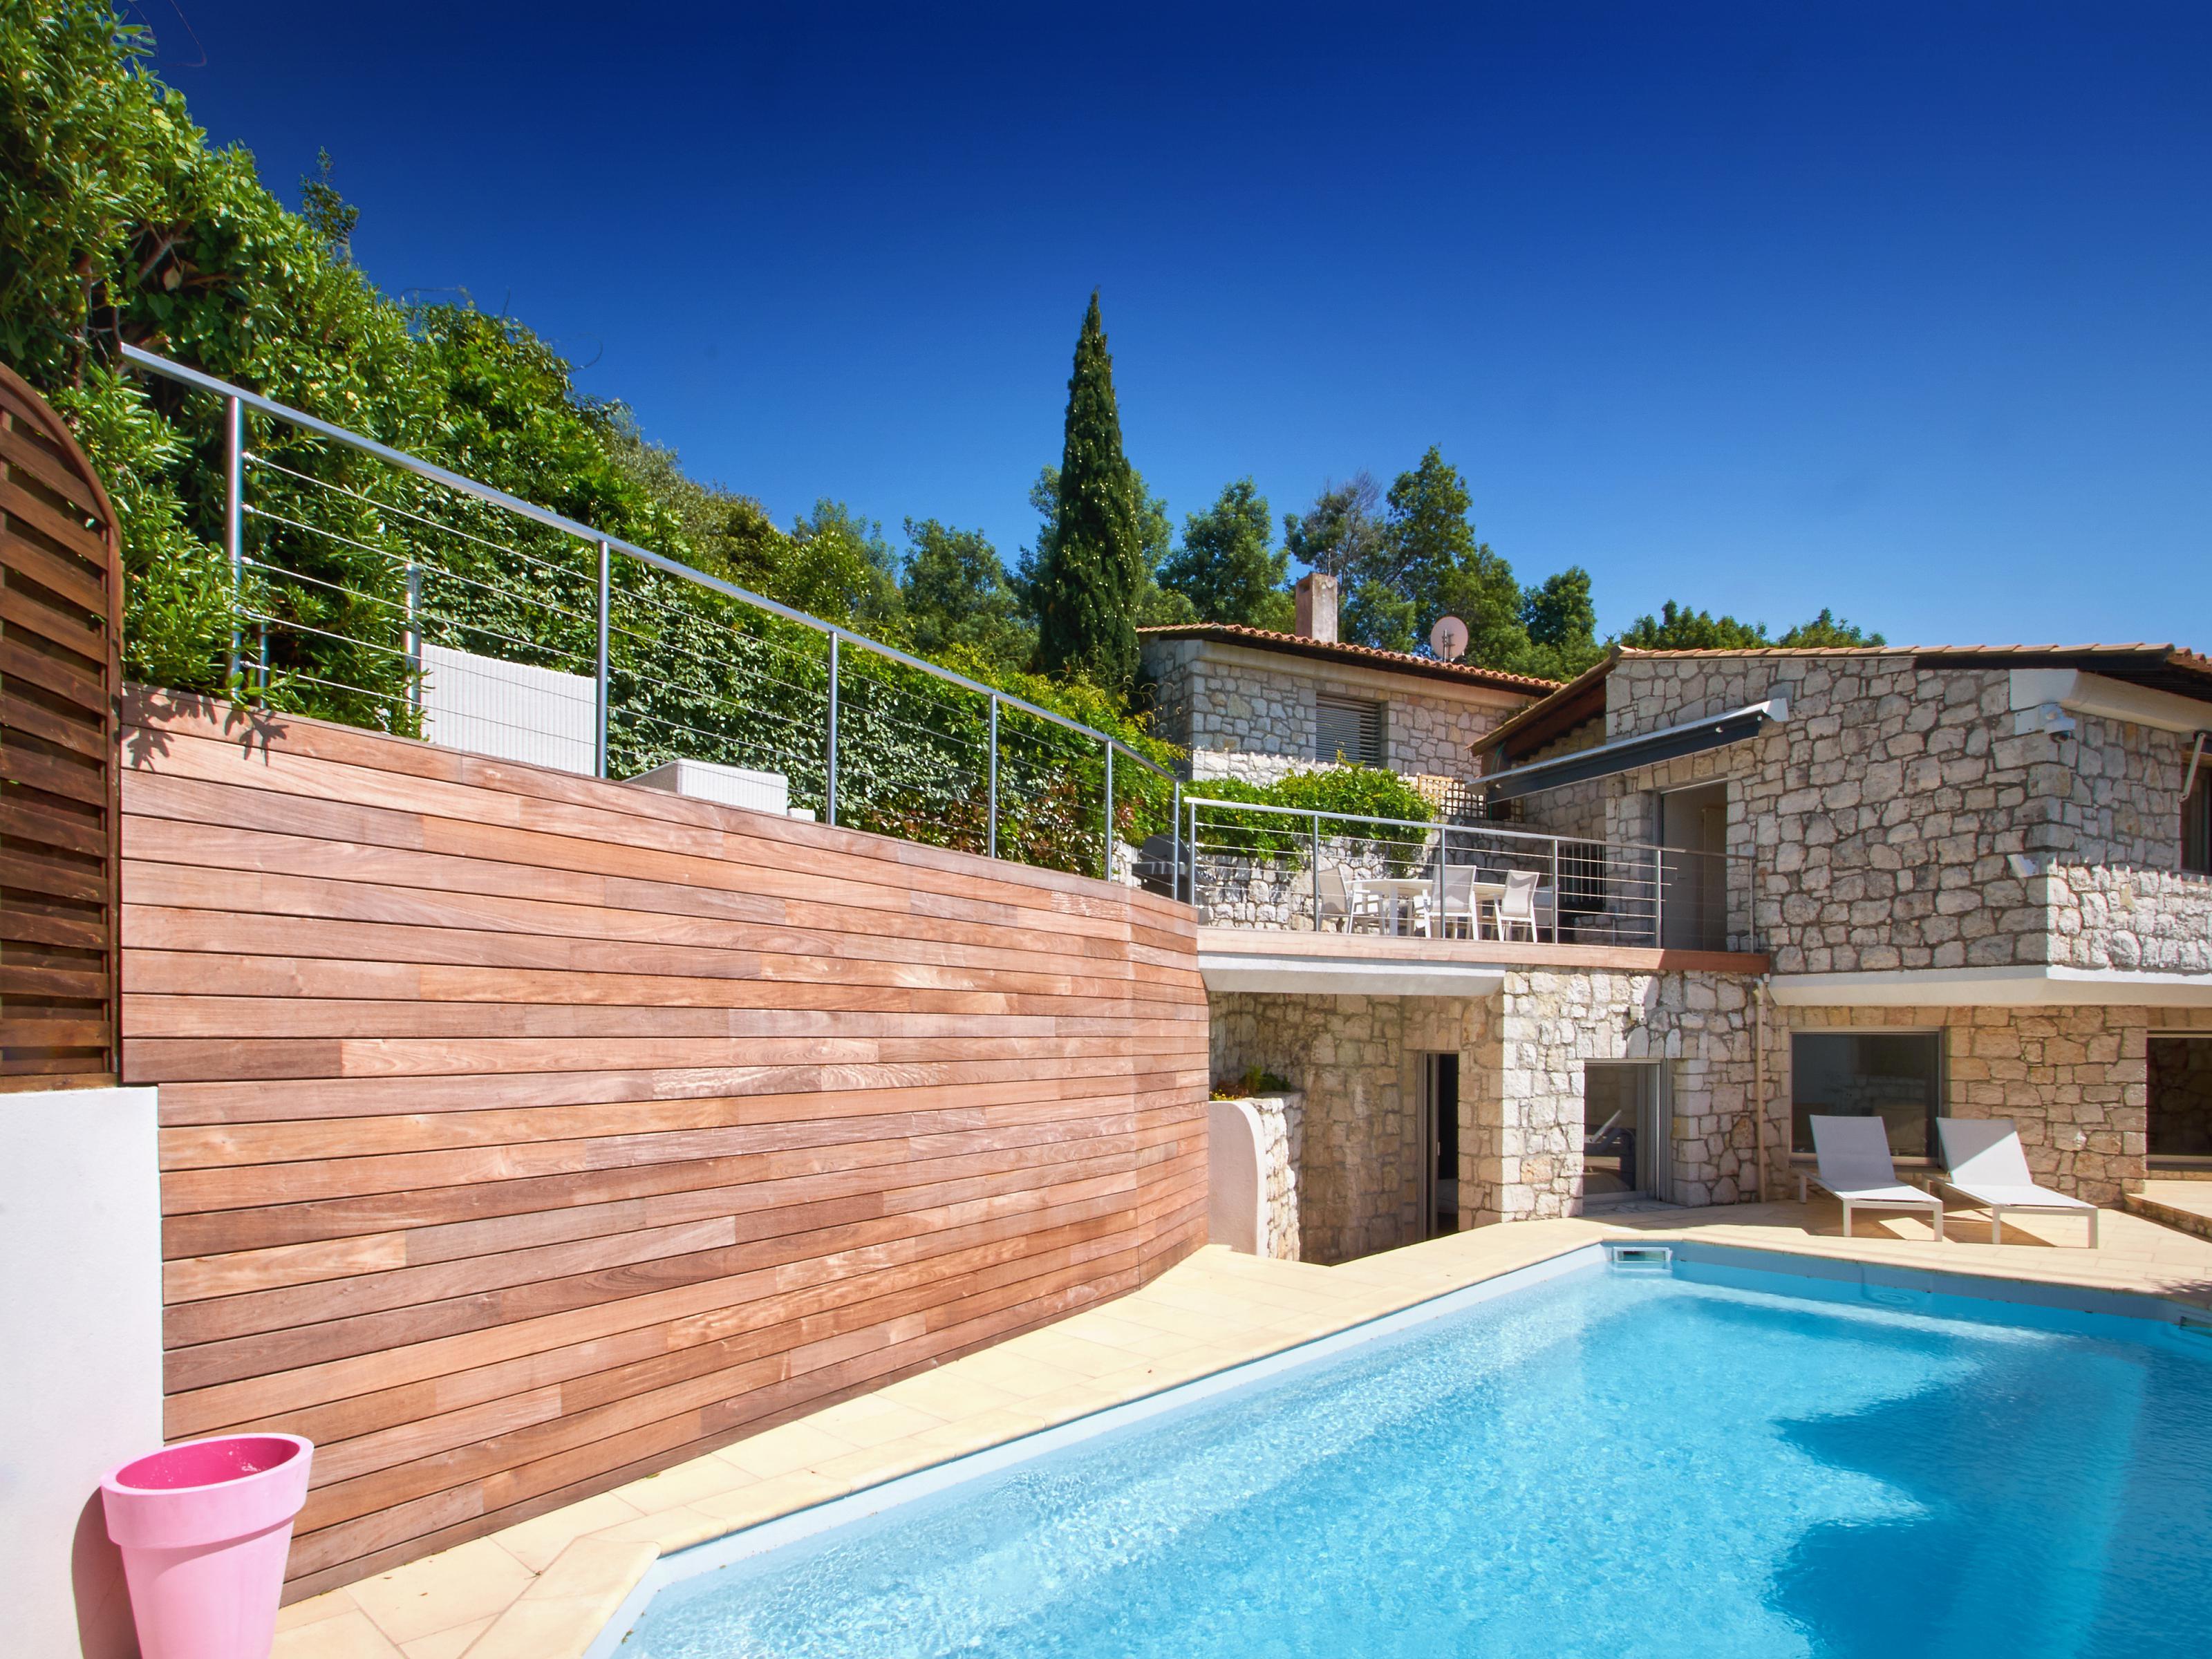 Tek Ailelik Ev için Satış at Rarely available 'villa - apartment' with sea views Cannes Cannes, Provence-Alpes-Cote D'Azur 06400 Fransa